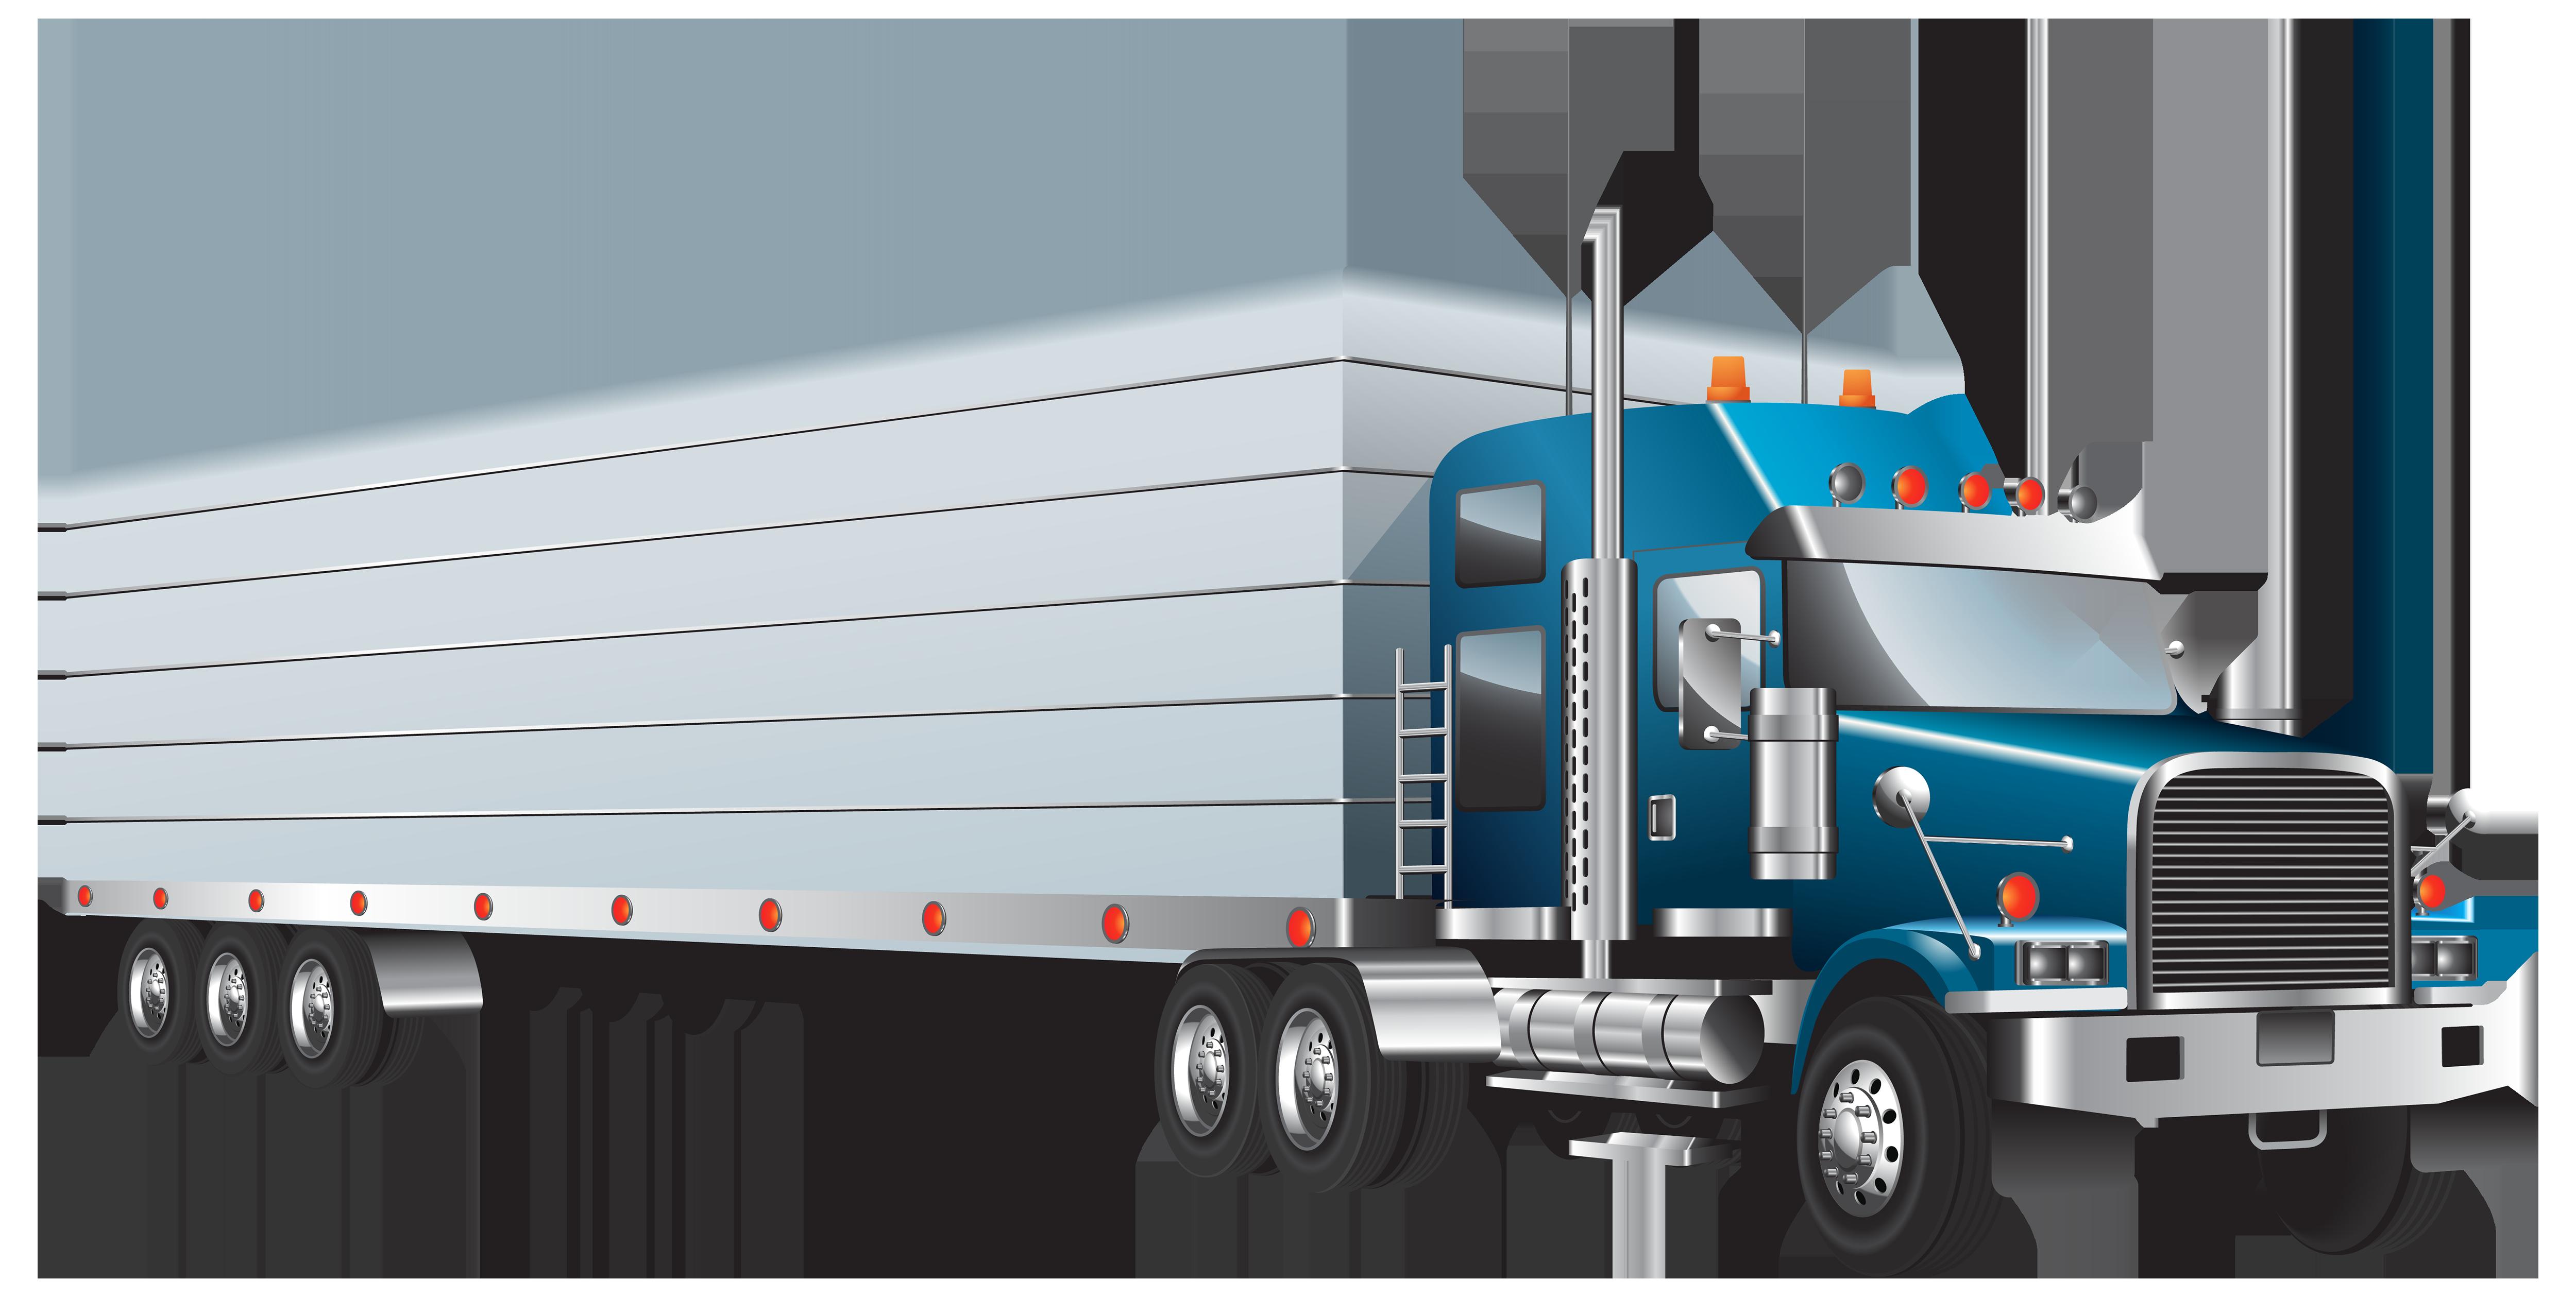 Png best web cartoons. Donut clipart truck